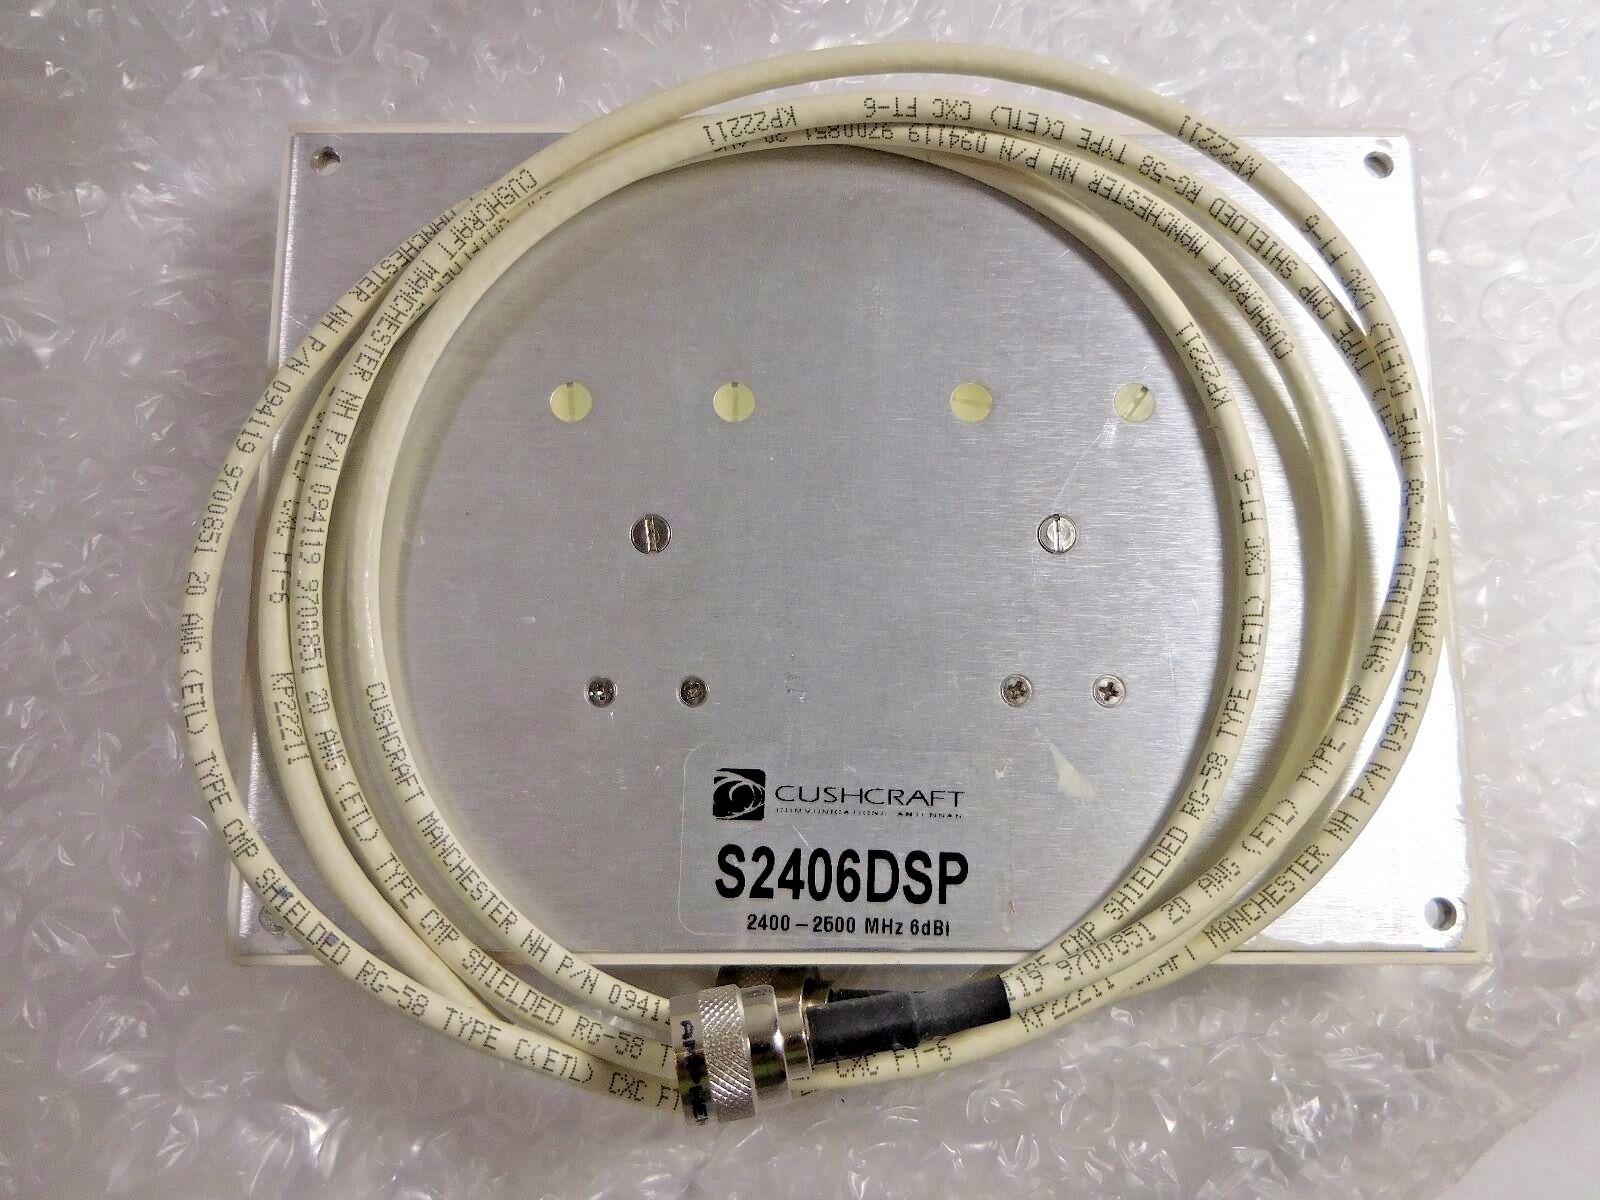 Cushcraft S2406DSP36RTN 2400-2500 MHz 6dBI Patch Antenna